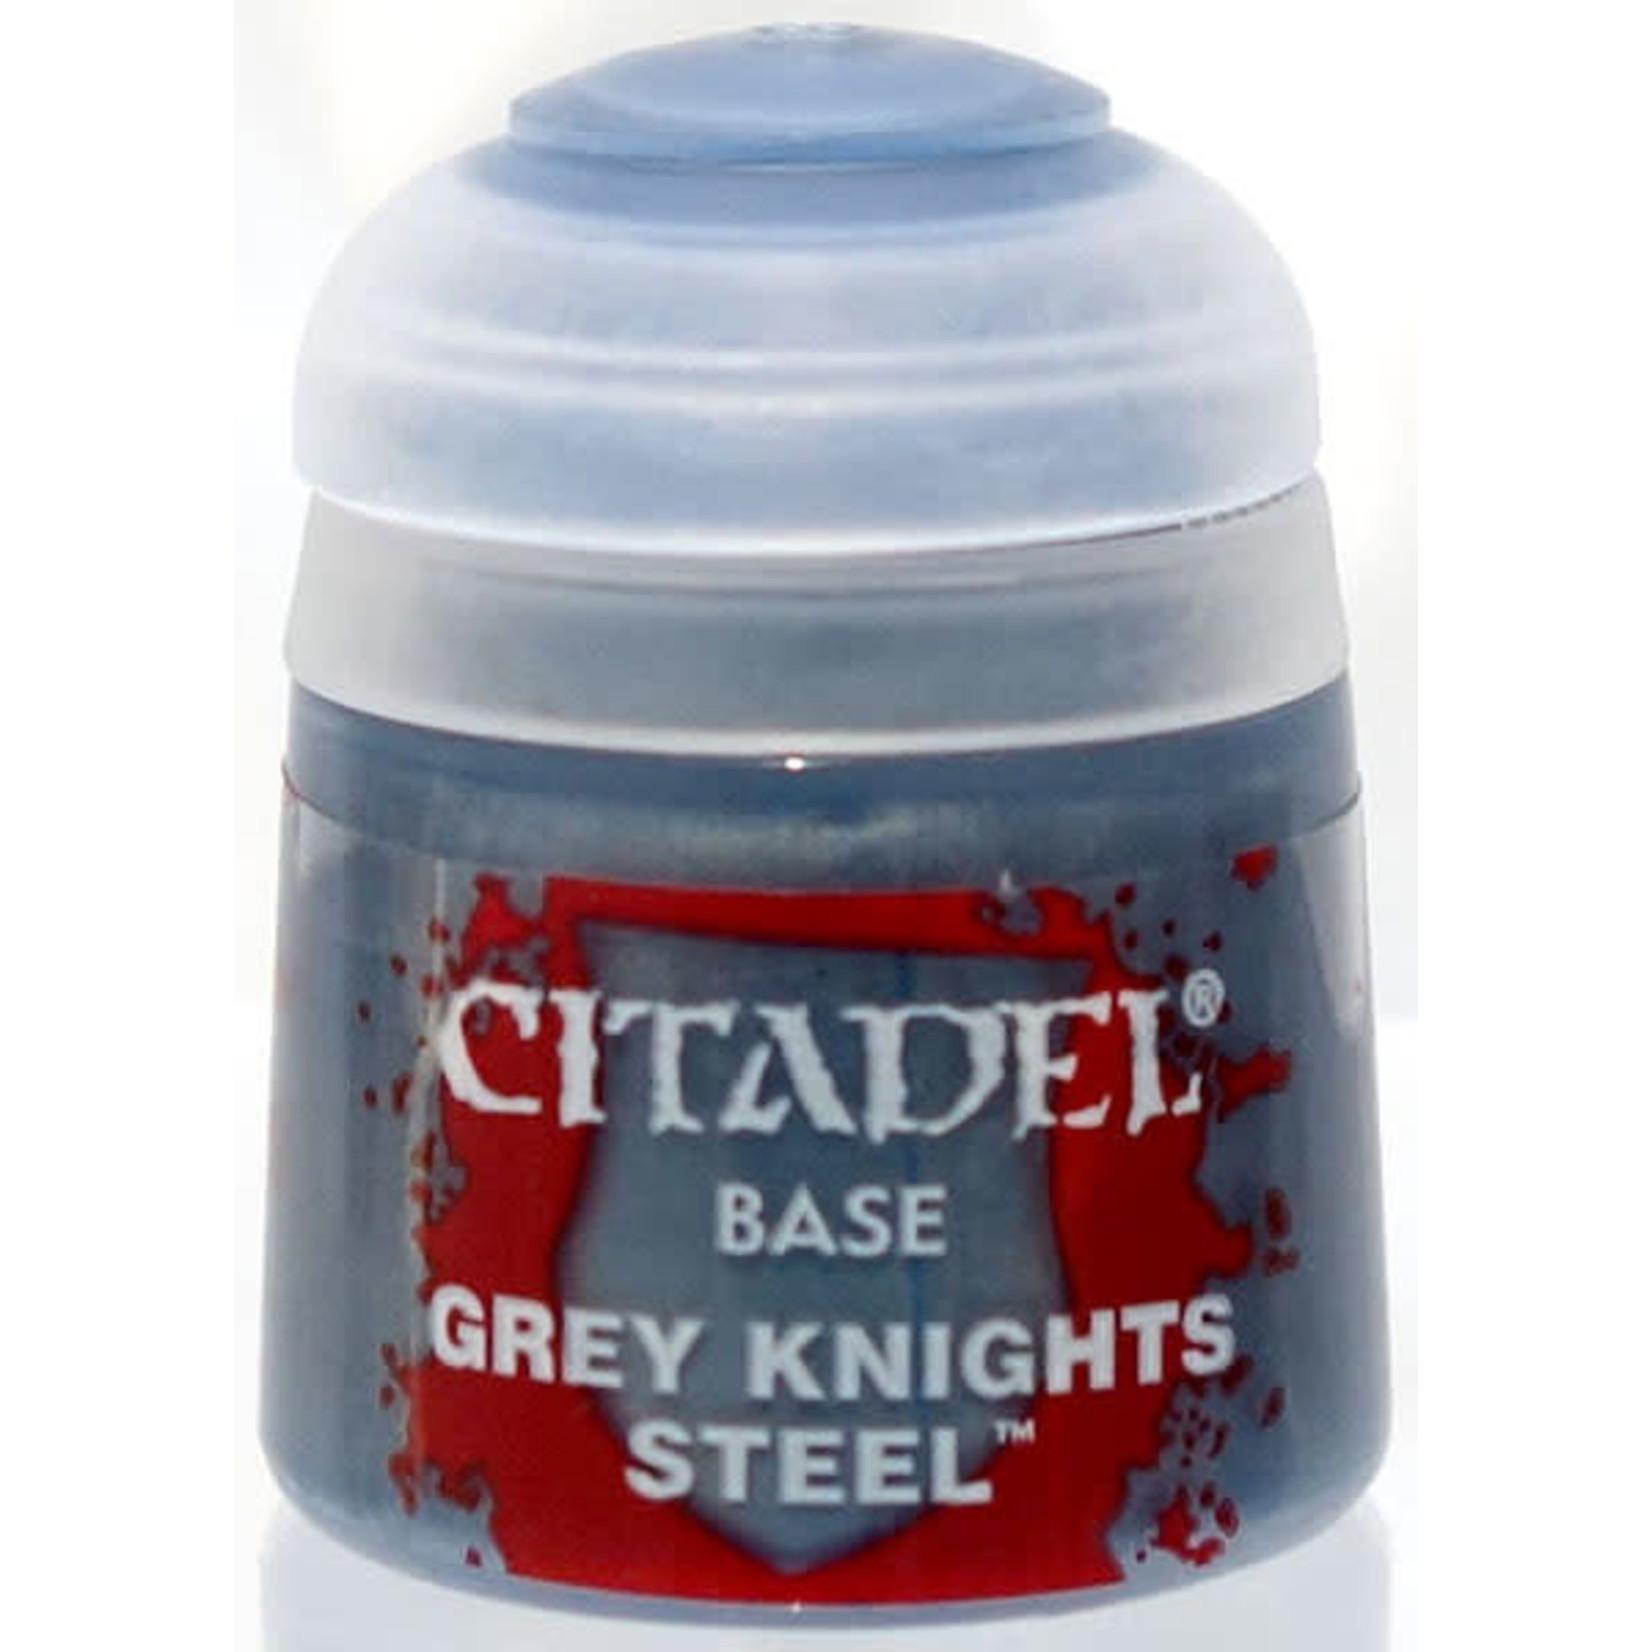 Games Workshop Citadel Paint: Grey Knights Steel Base 12 ml